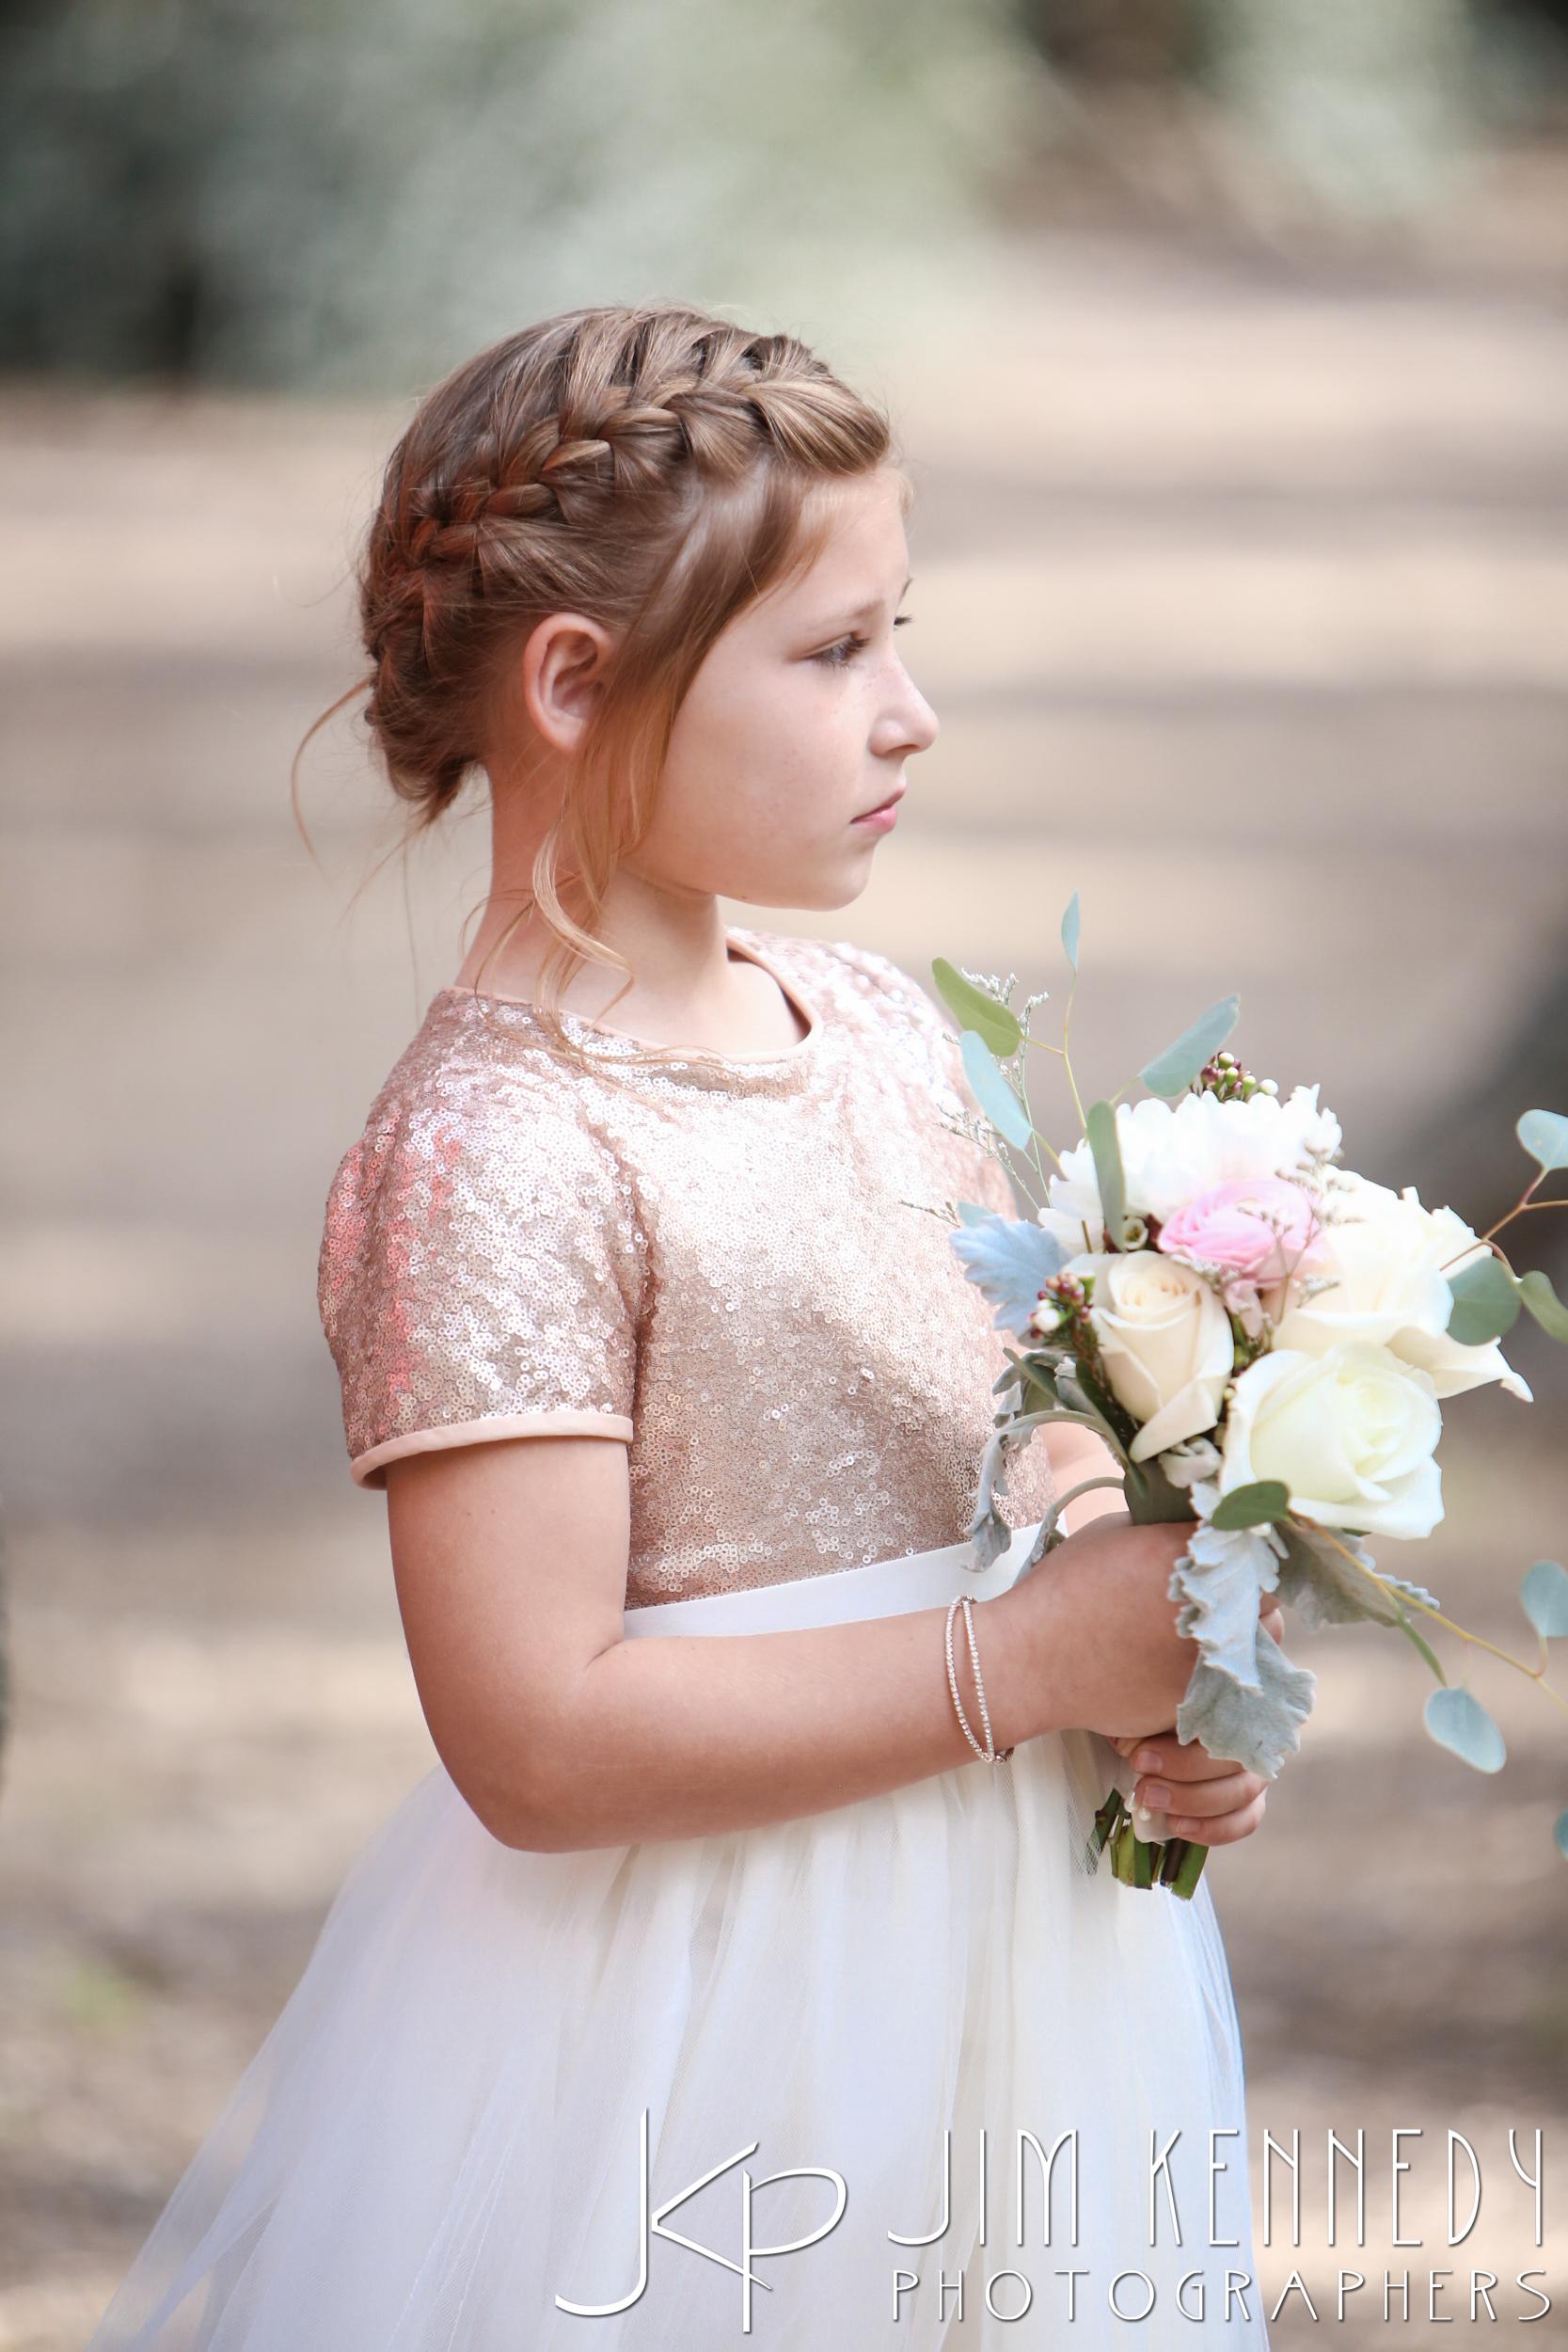 jim_kennedy_photographers_highland_springs_wedding_caitlyn_0053.jpg